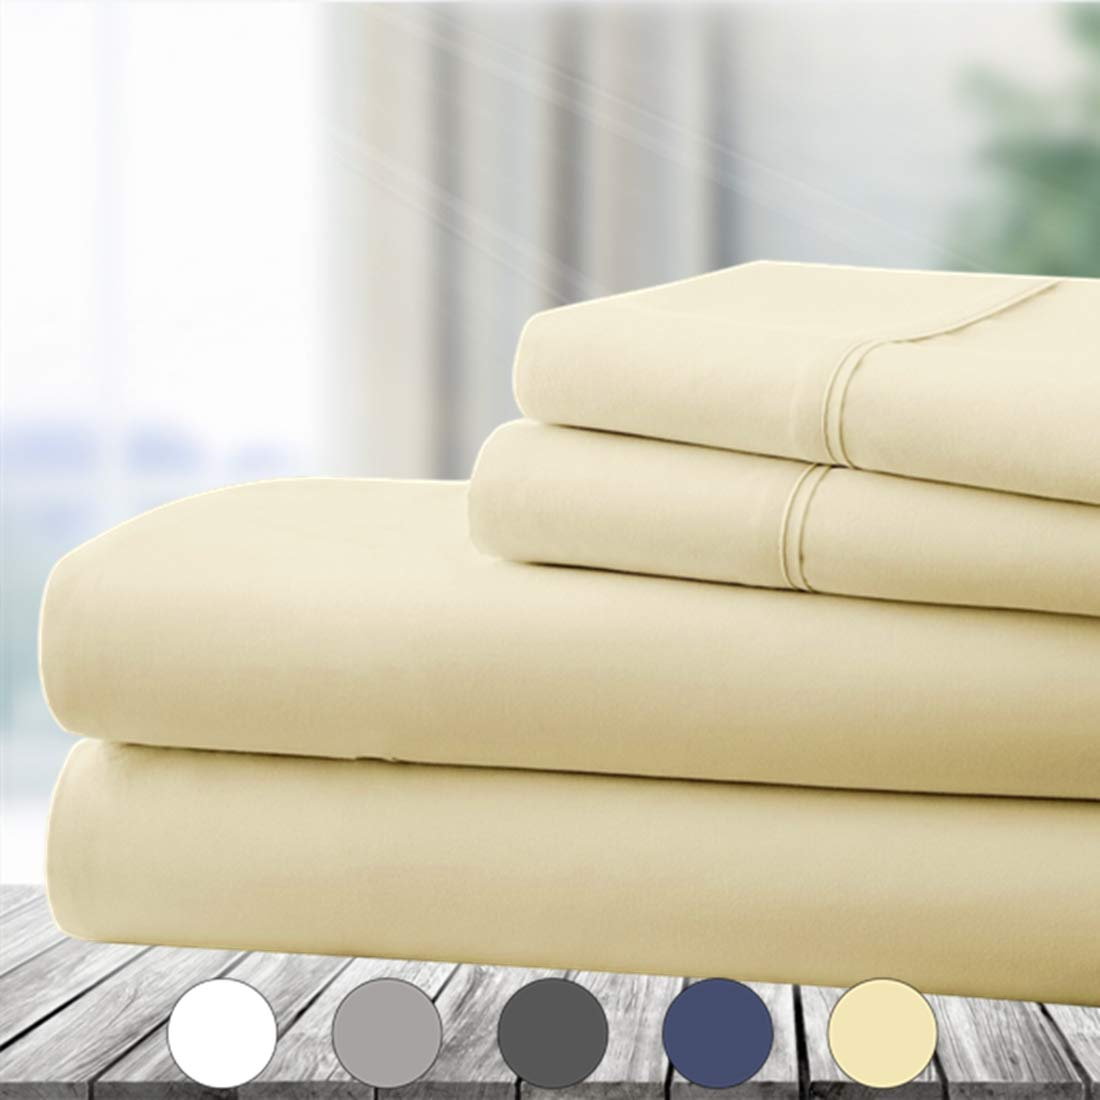 Abakan Bed Sheet Set 4 Piece Super Soft Brushed Microfiber 1800 Series Hotel Luxury Egyptian Sheet Breathable, Wrinkle, Fade Resistant Deep Pocket Bedding Sheet Set (Cal King, Ivory)